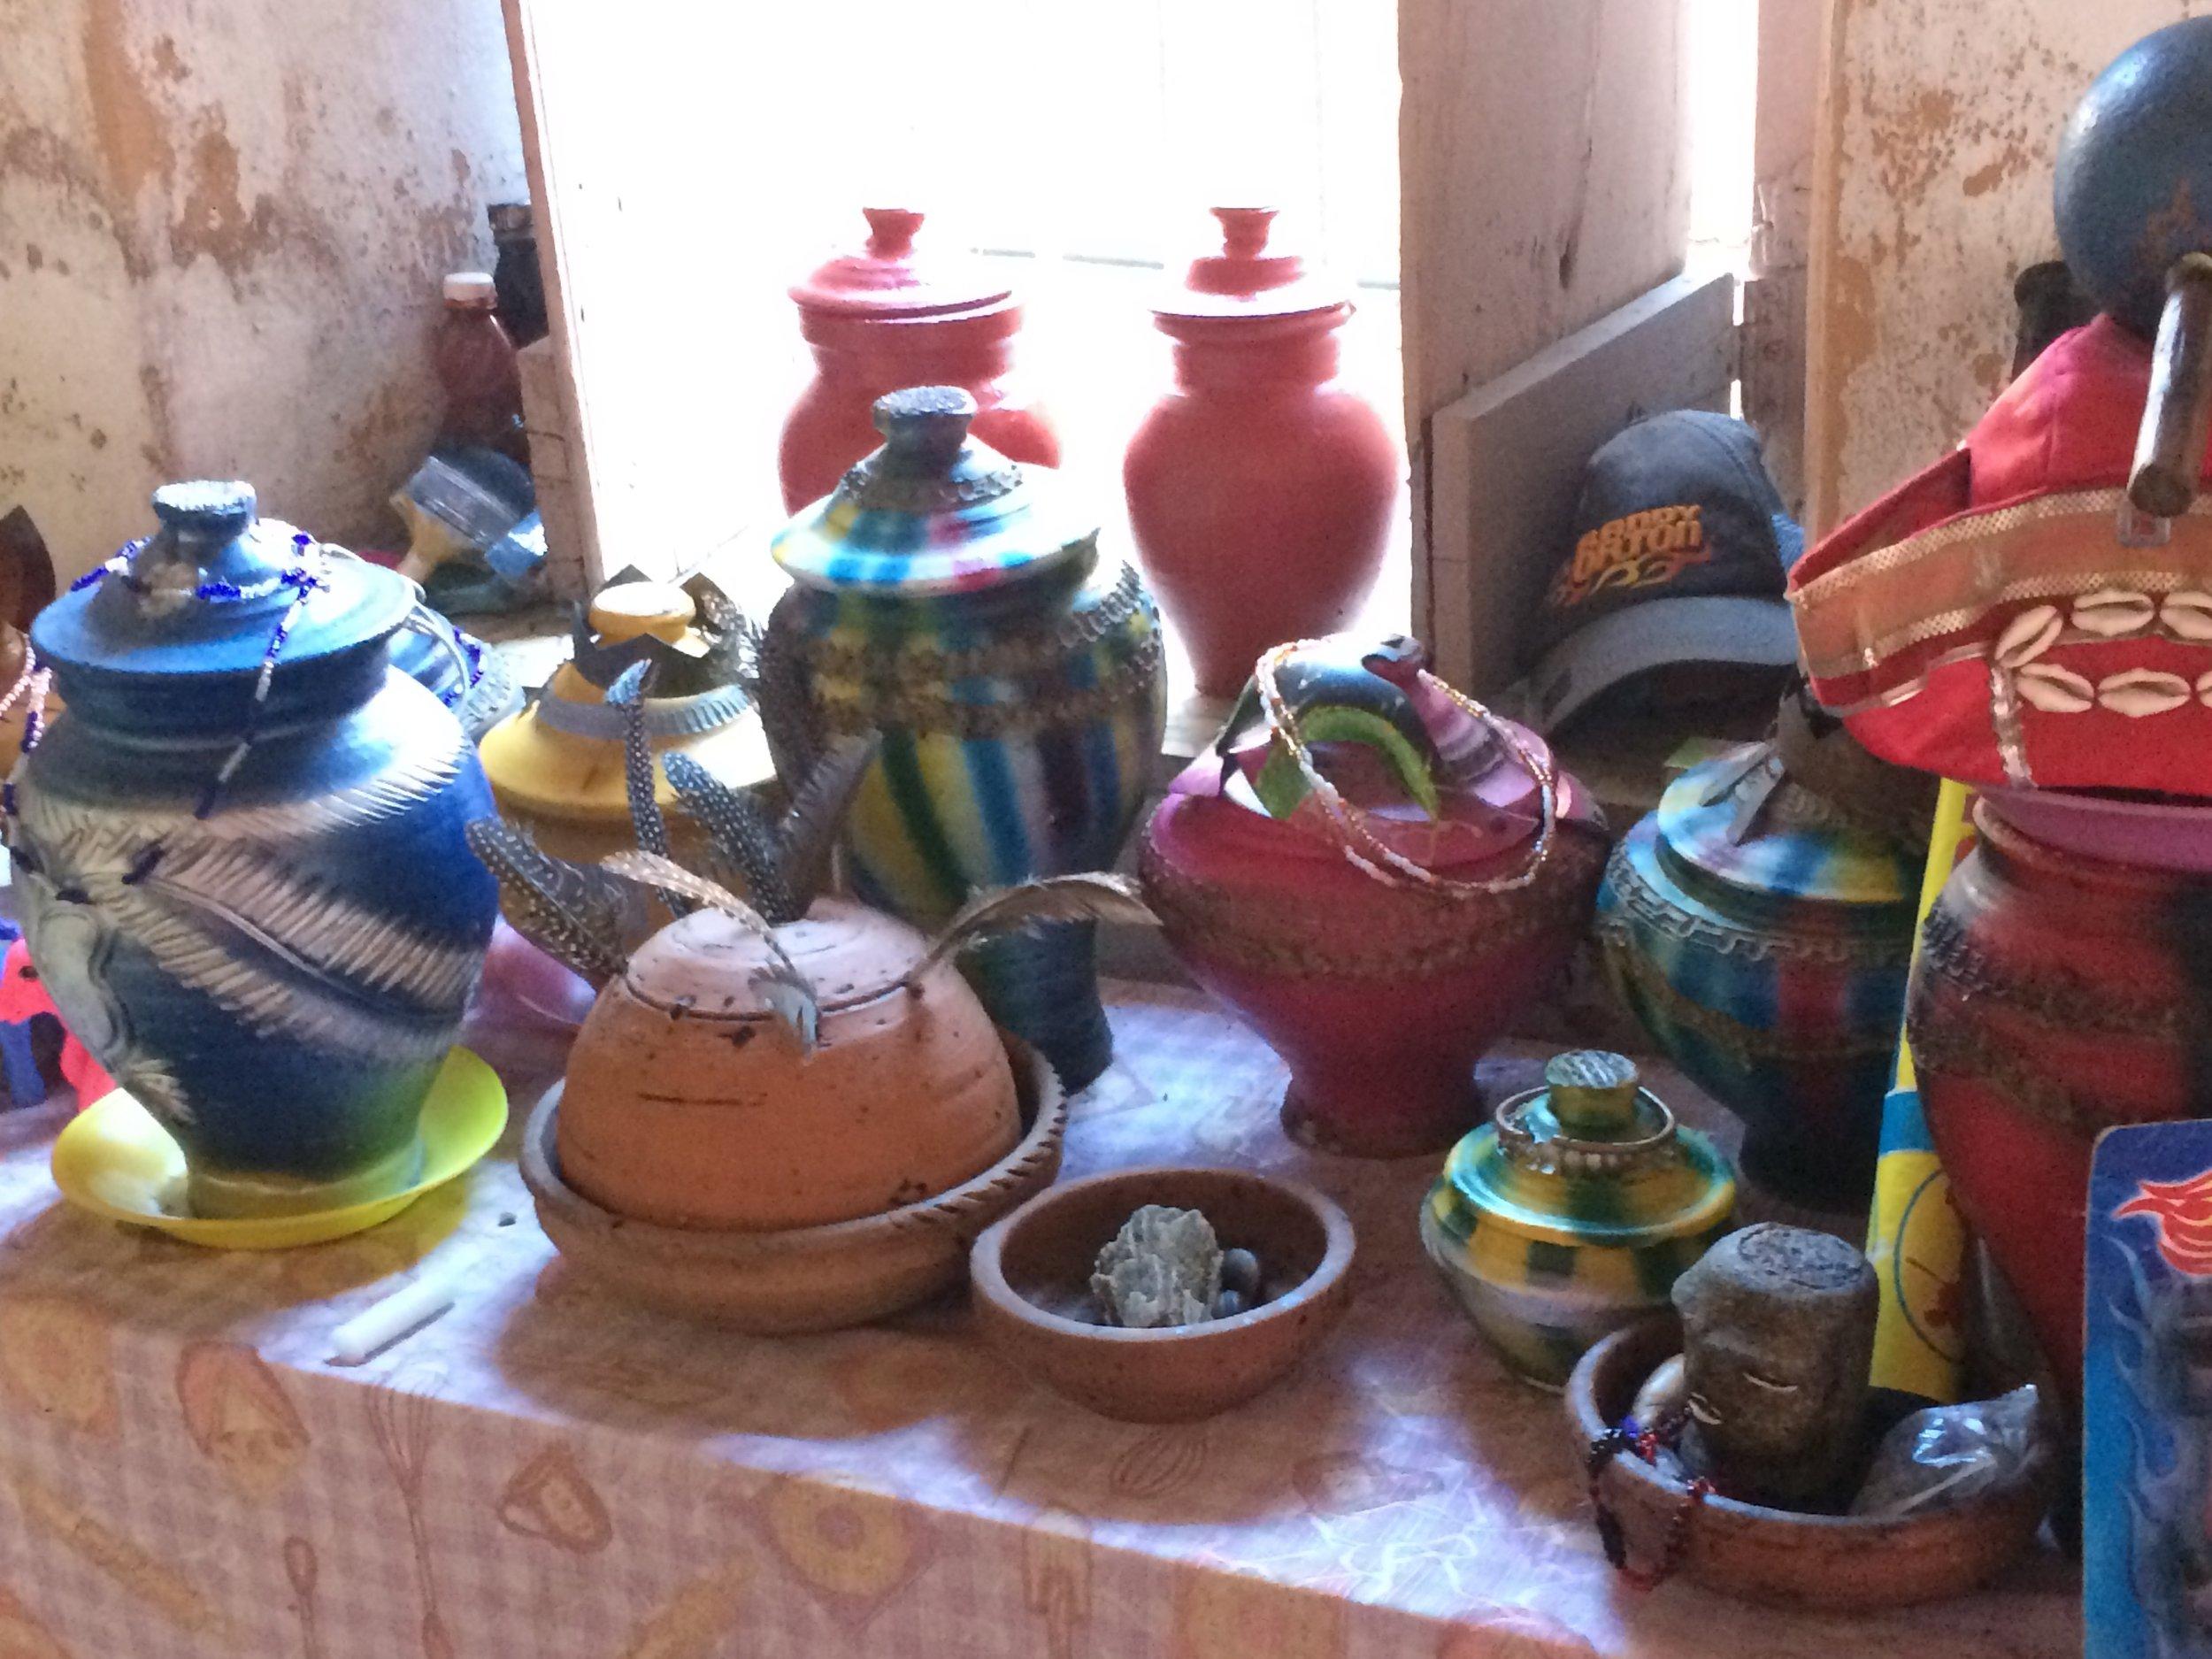 We visited the home of a Santería priestess. Urns, perhaps